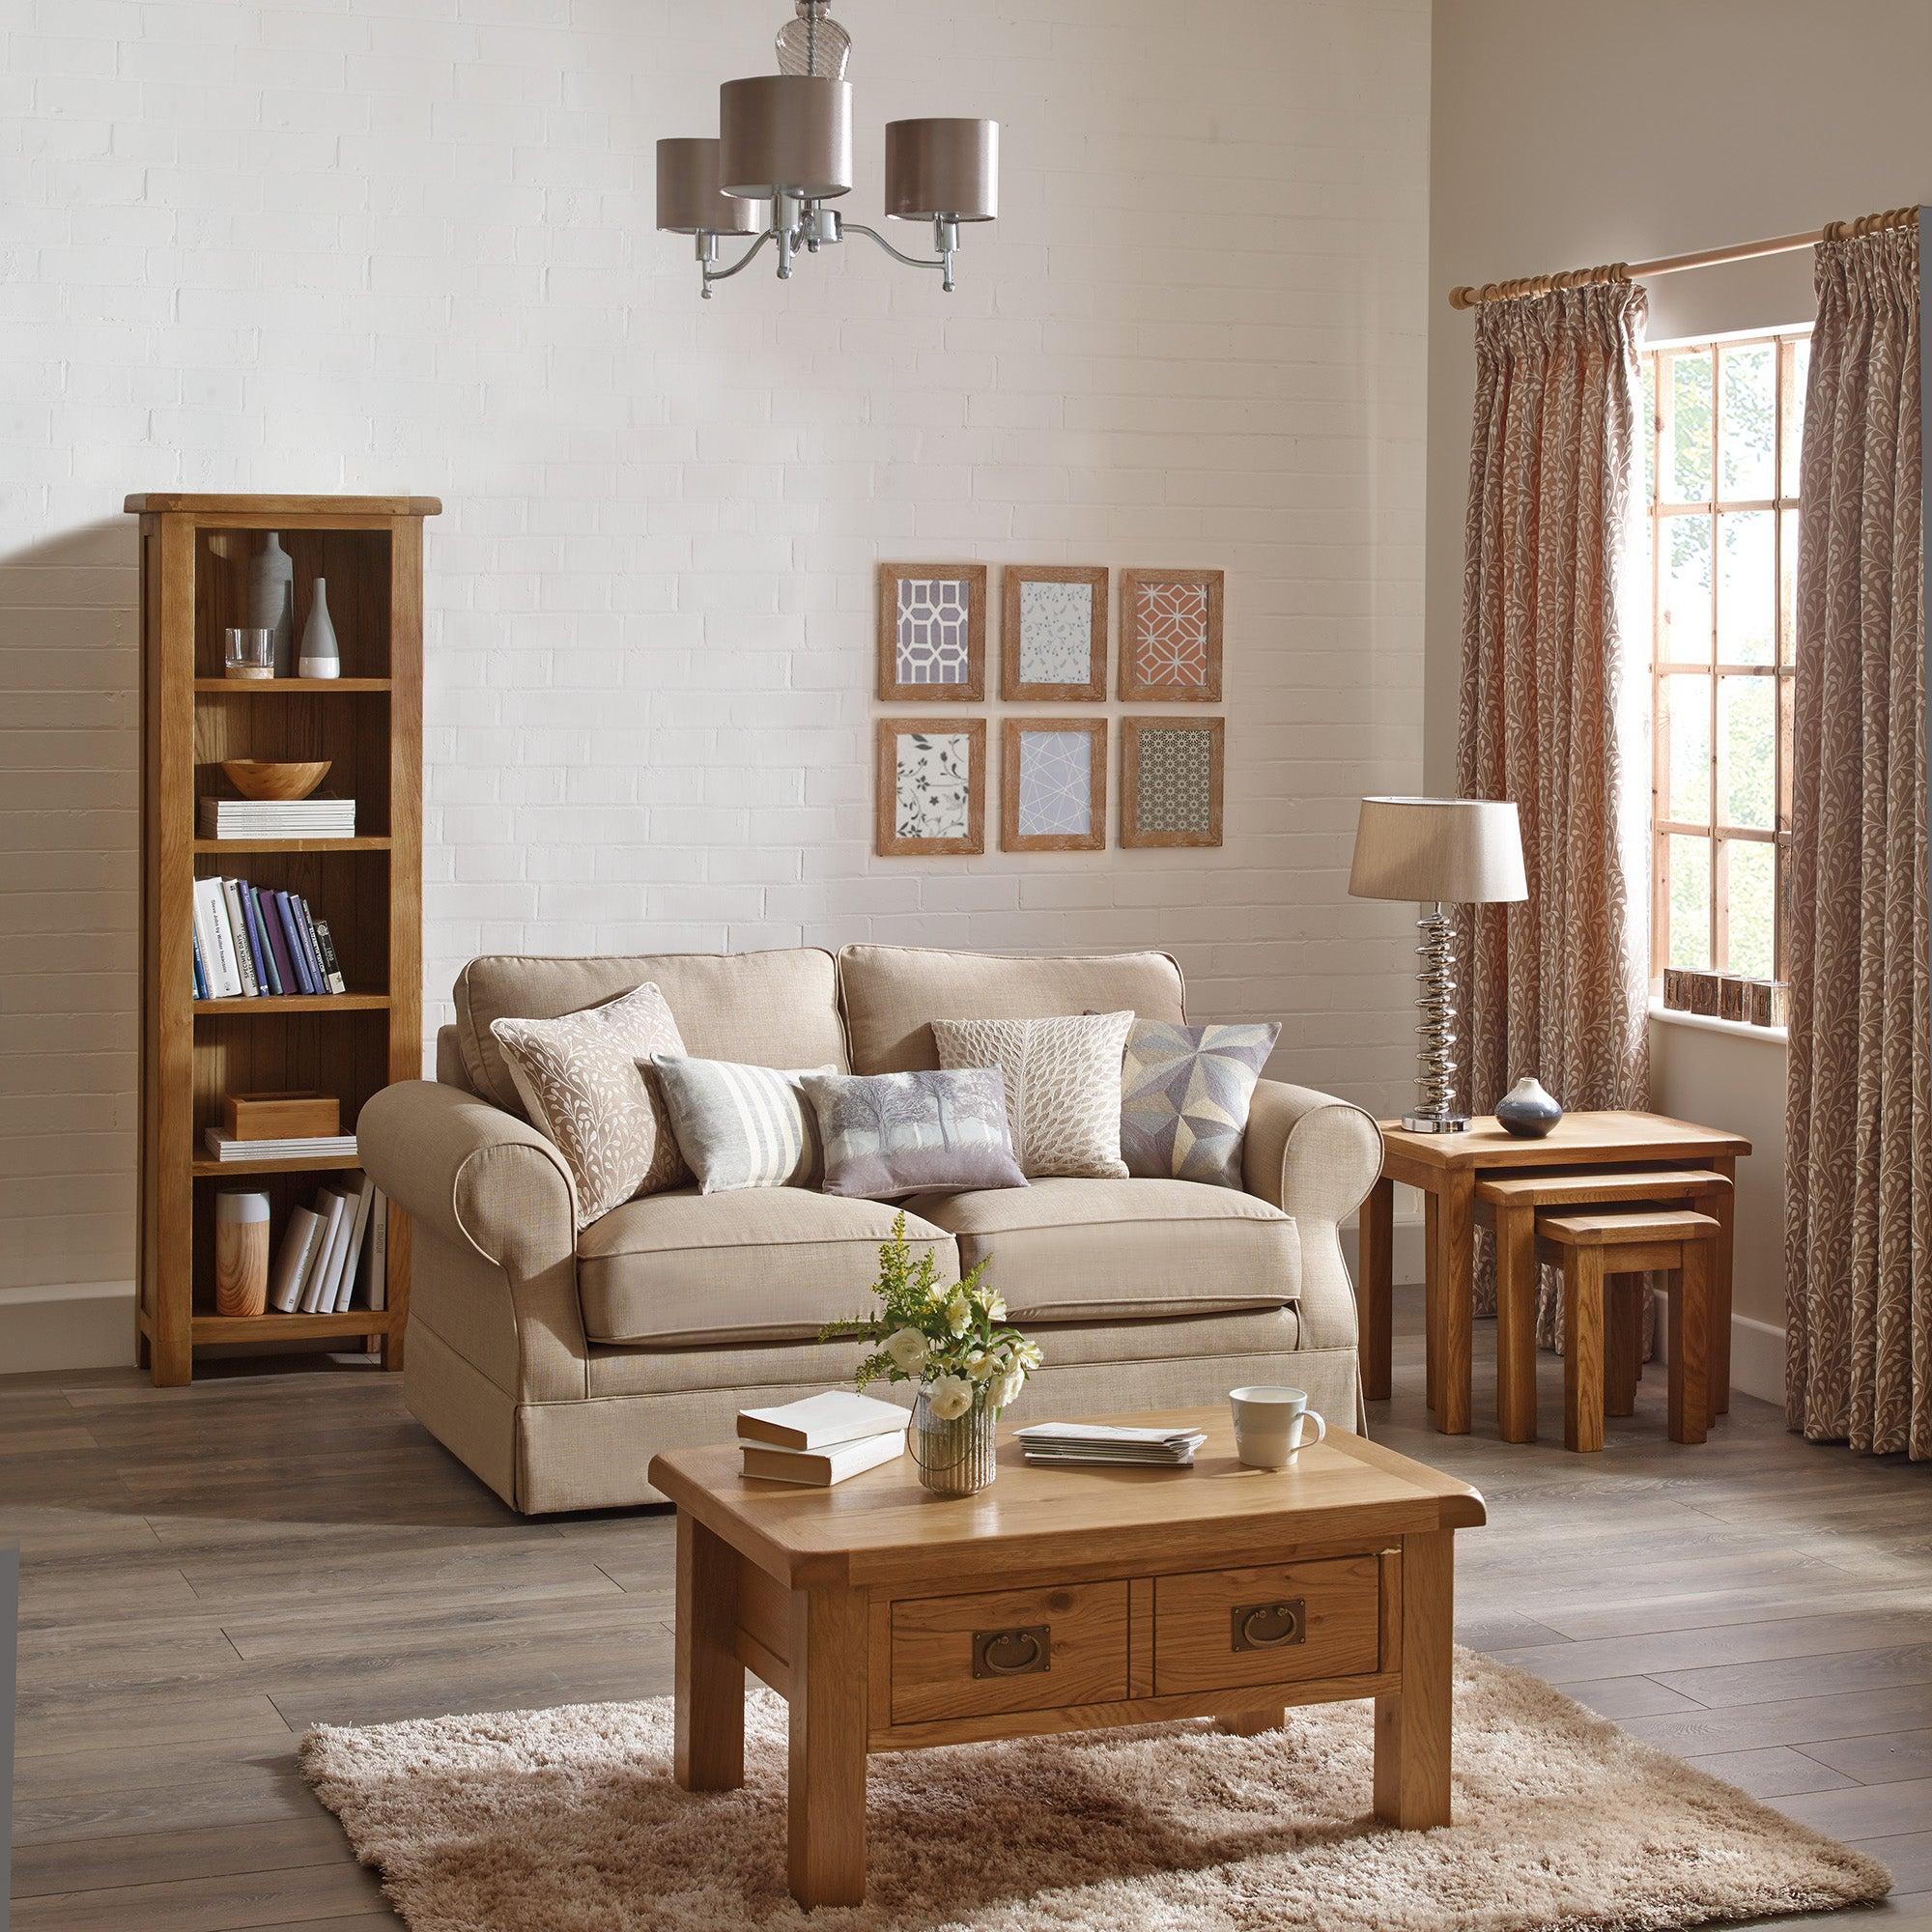 Dunelm Aylesbury Living Room